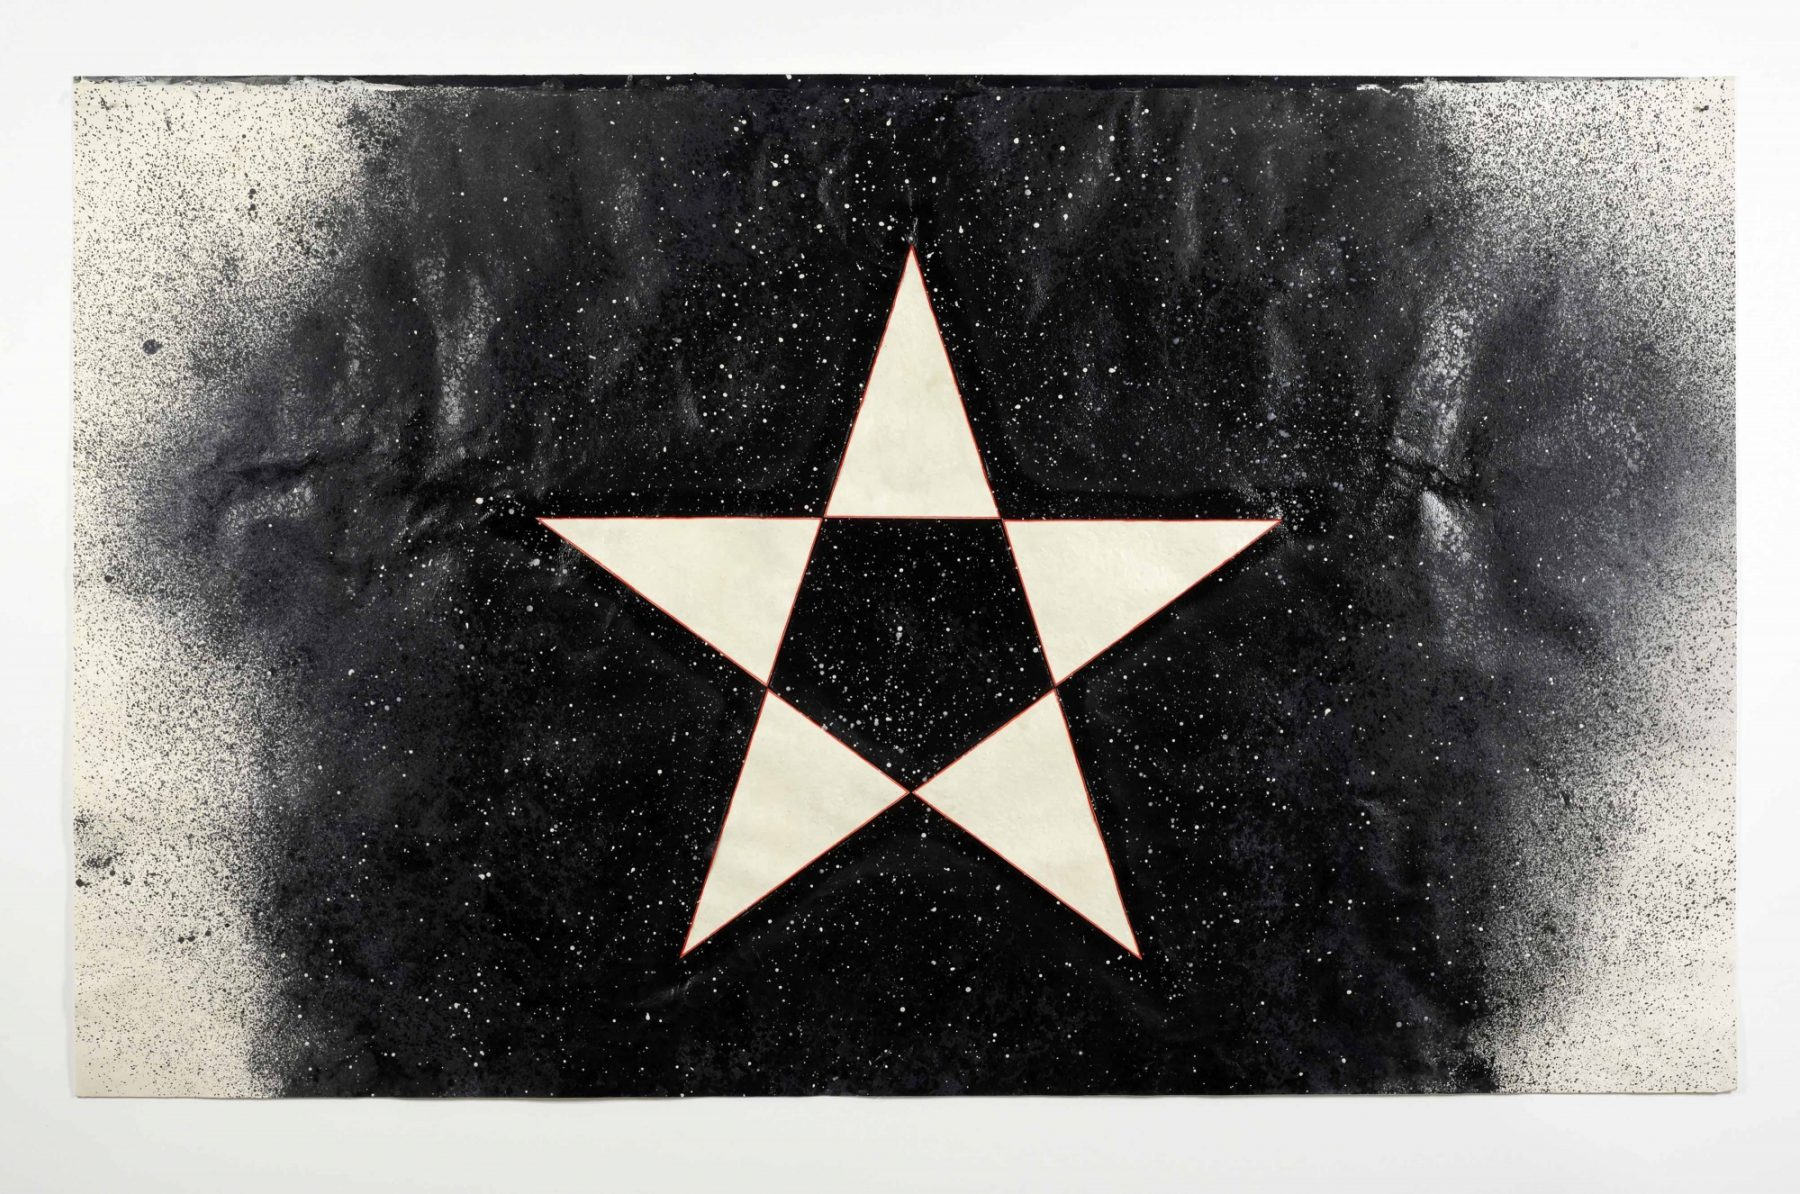 Stella celeste (Celestial Star)